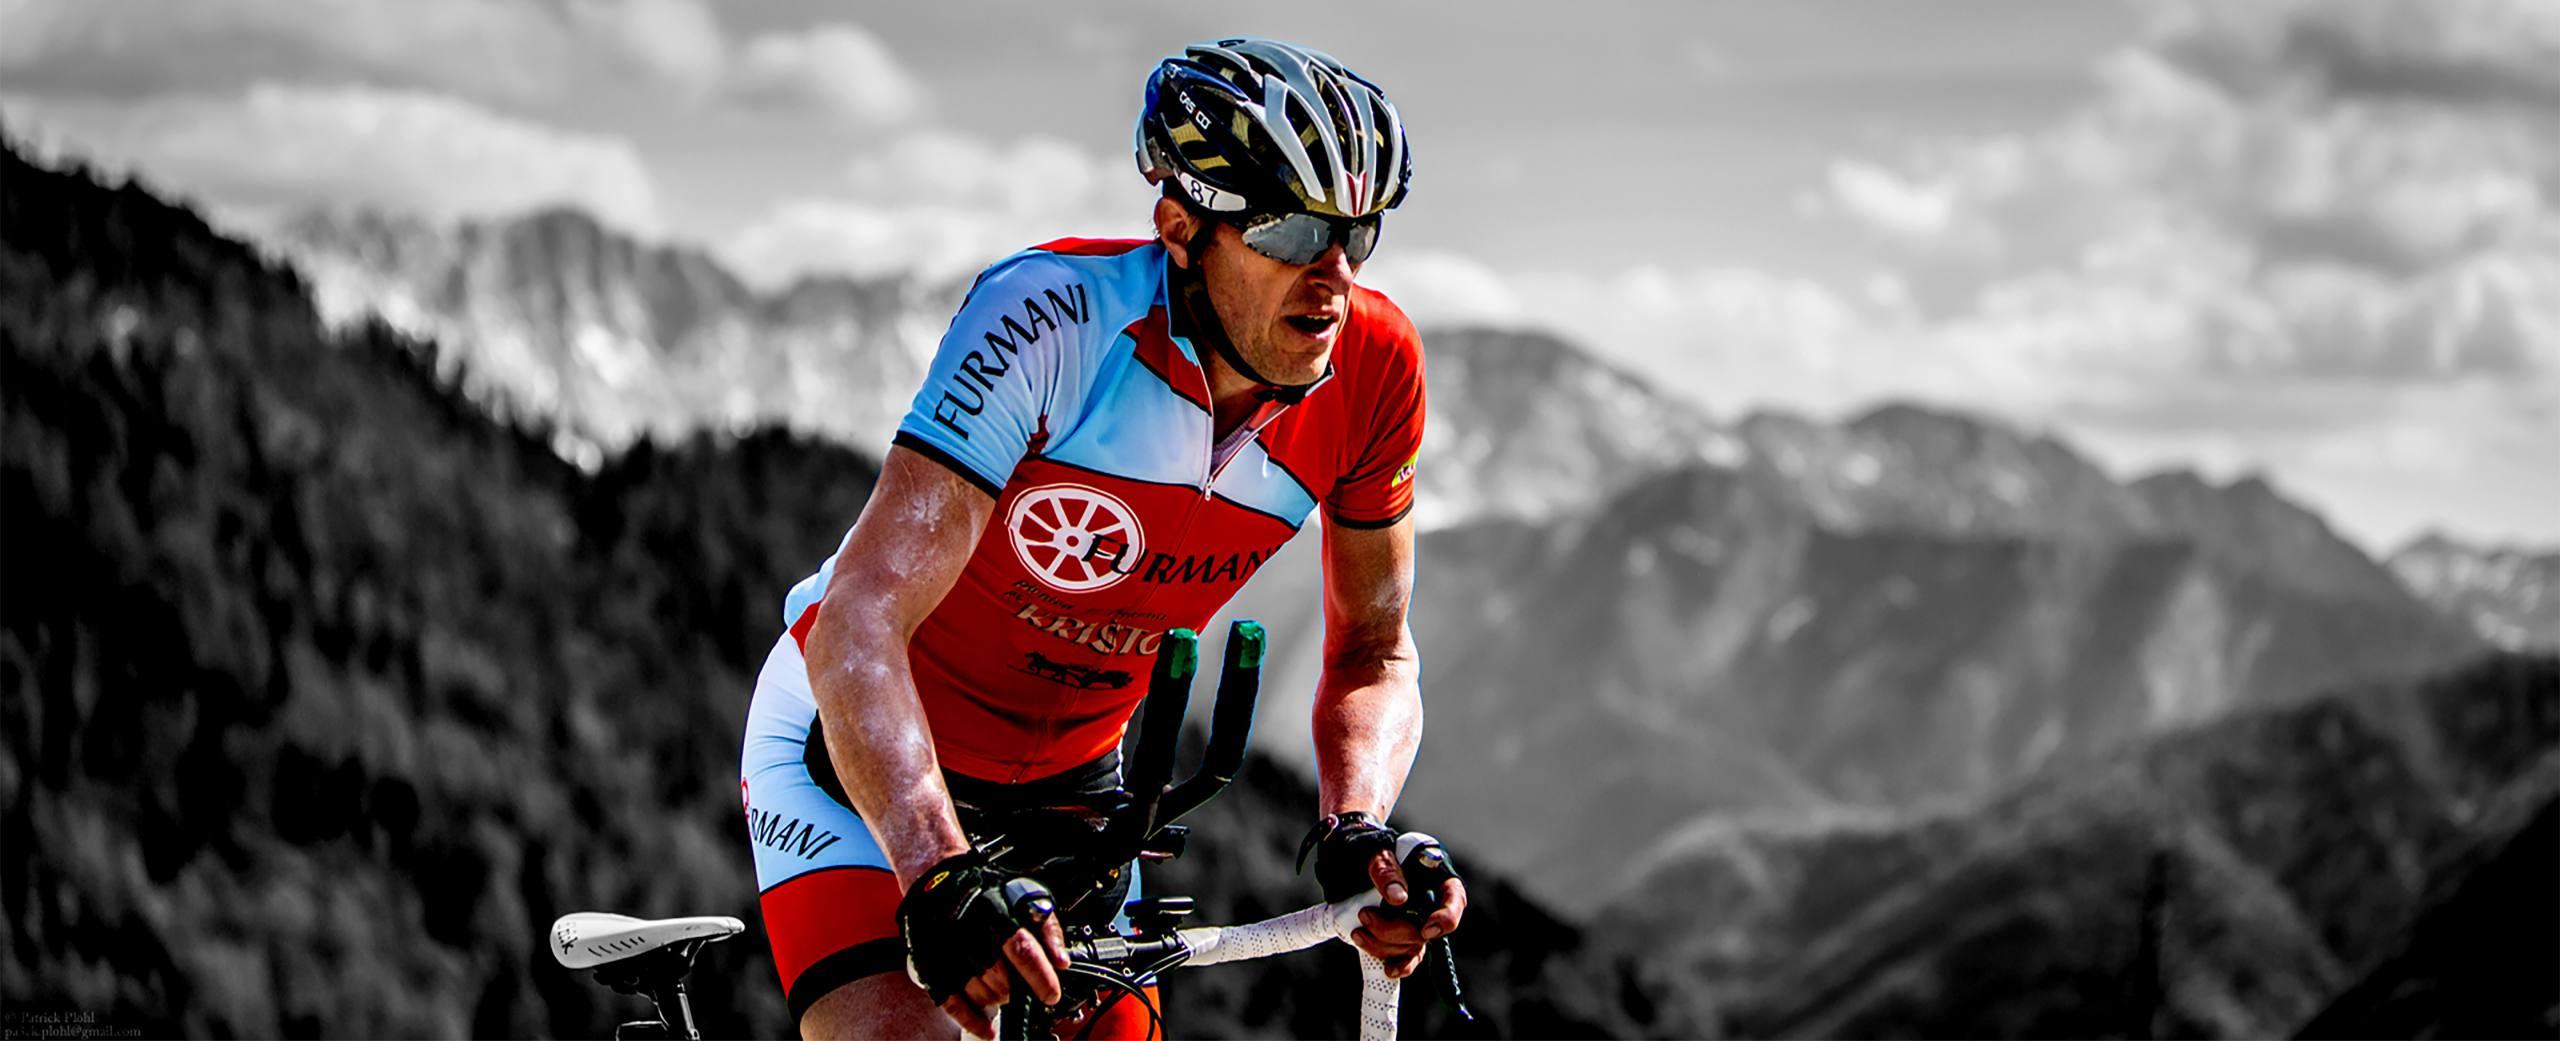 Wooden bike, Wooden bike frame, Wooden mountain bike, Eco friendly bike – spring-sport.si članki 1606660295